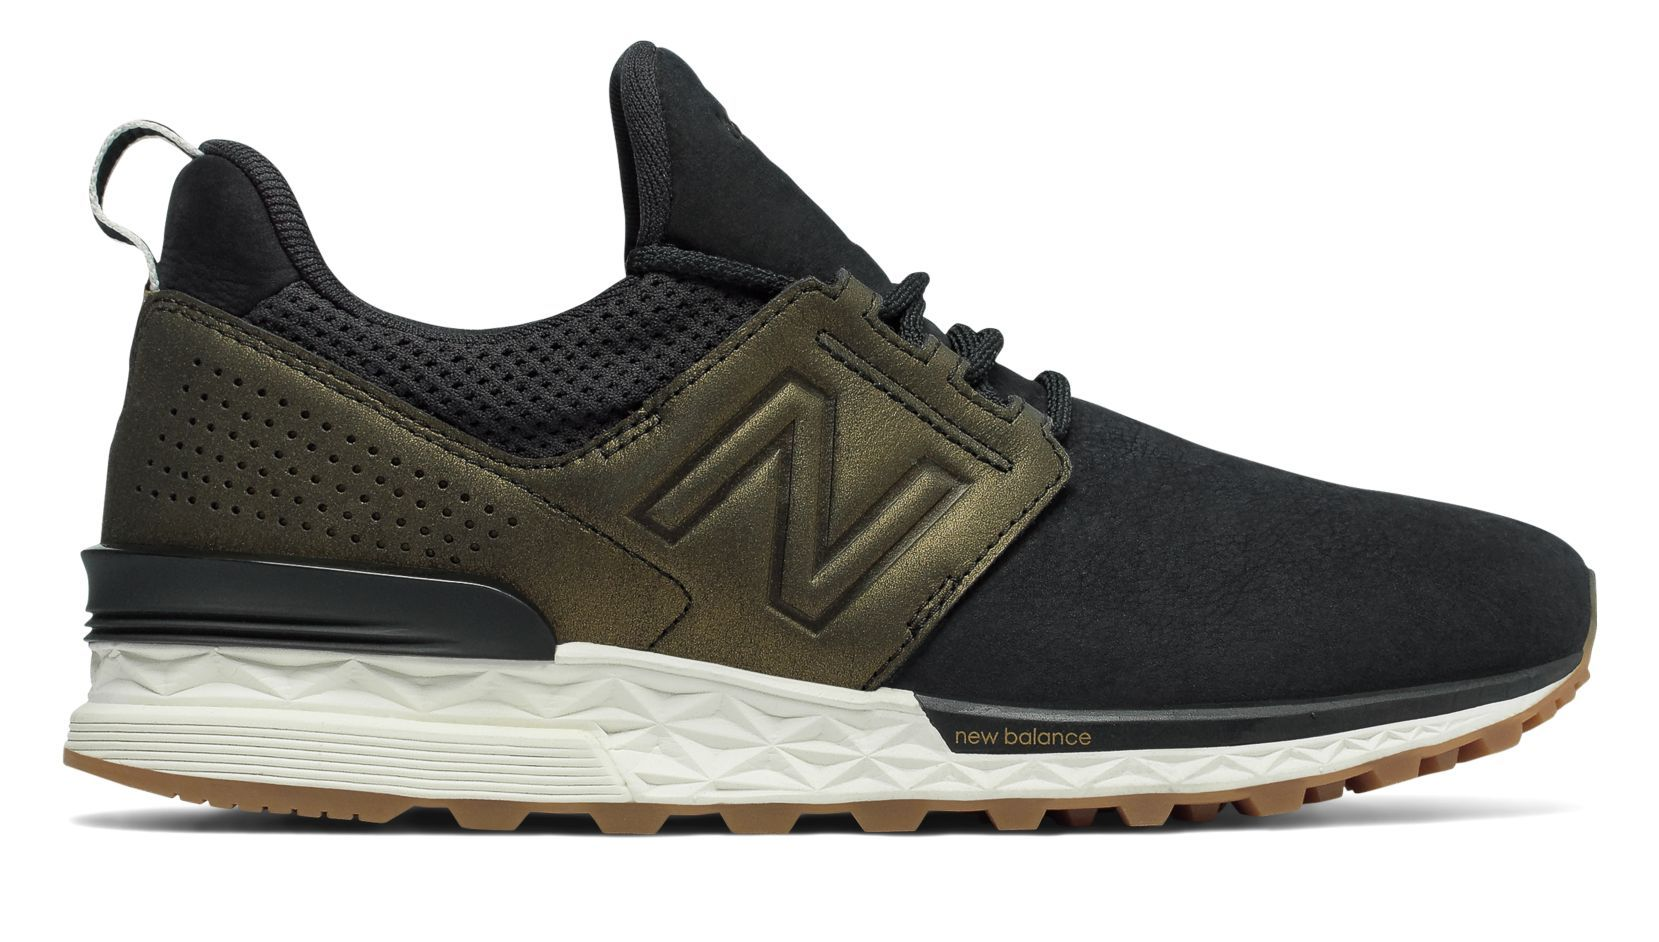 New Balance Nubuck 574 Sport, Black